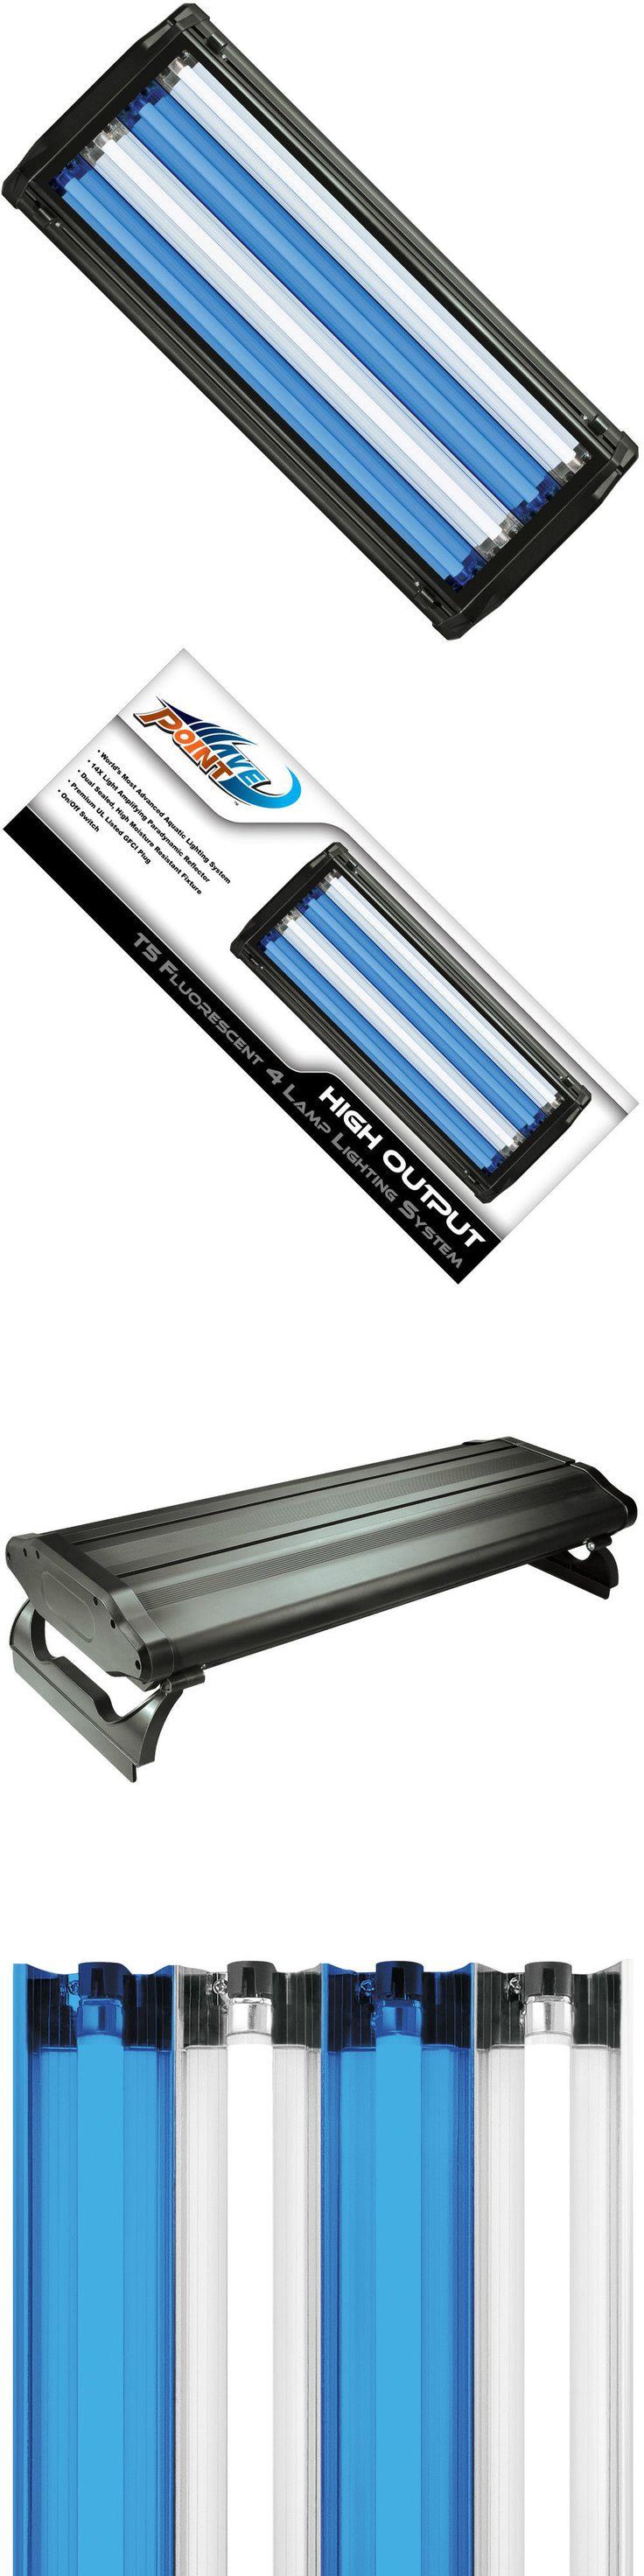 Lighting and Bulbs 46314: Wave Point Aquarium Fish Tank 96-Watt 4X 24W 24 Ho T5 4-Lamp Light Water Resist -> BUY IT NOW ONLY: $130.99 on eBay!